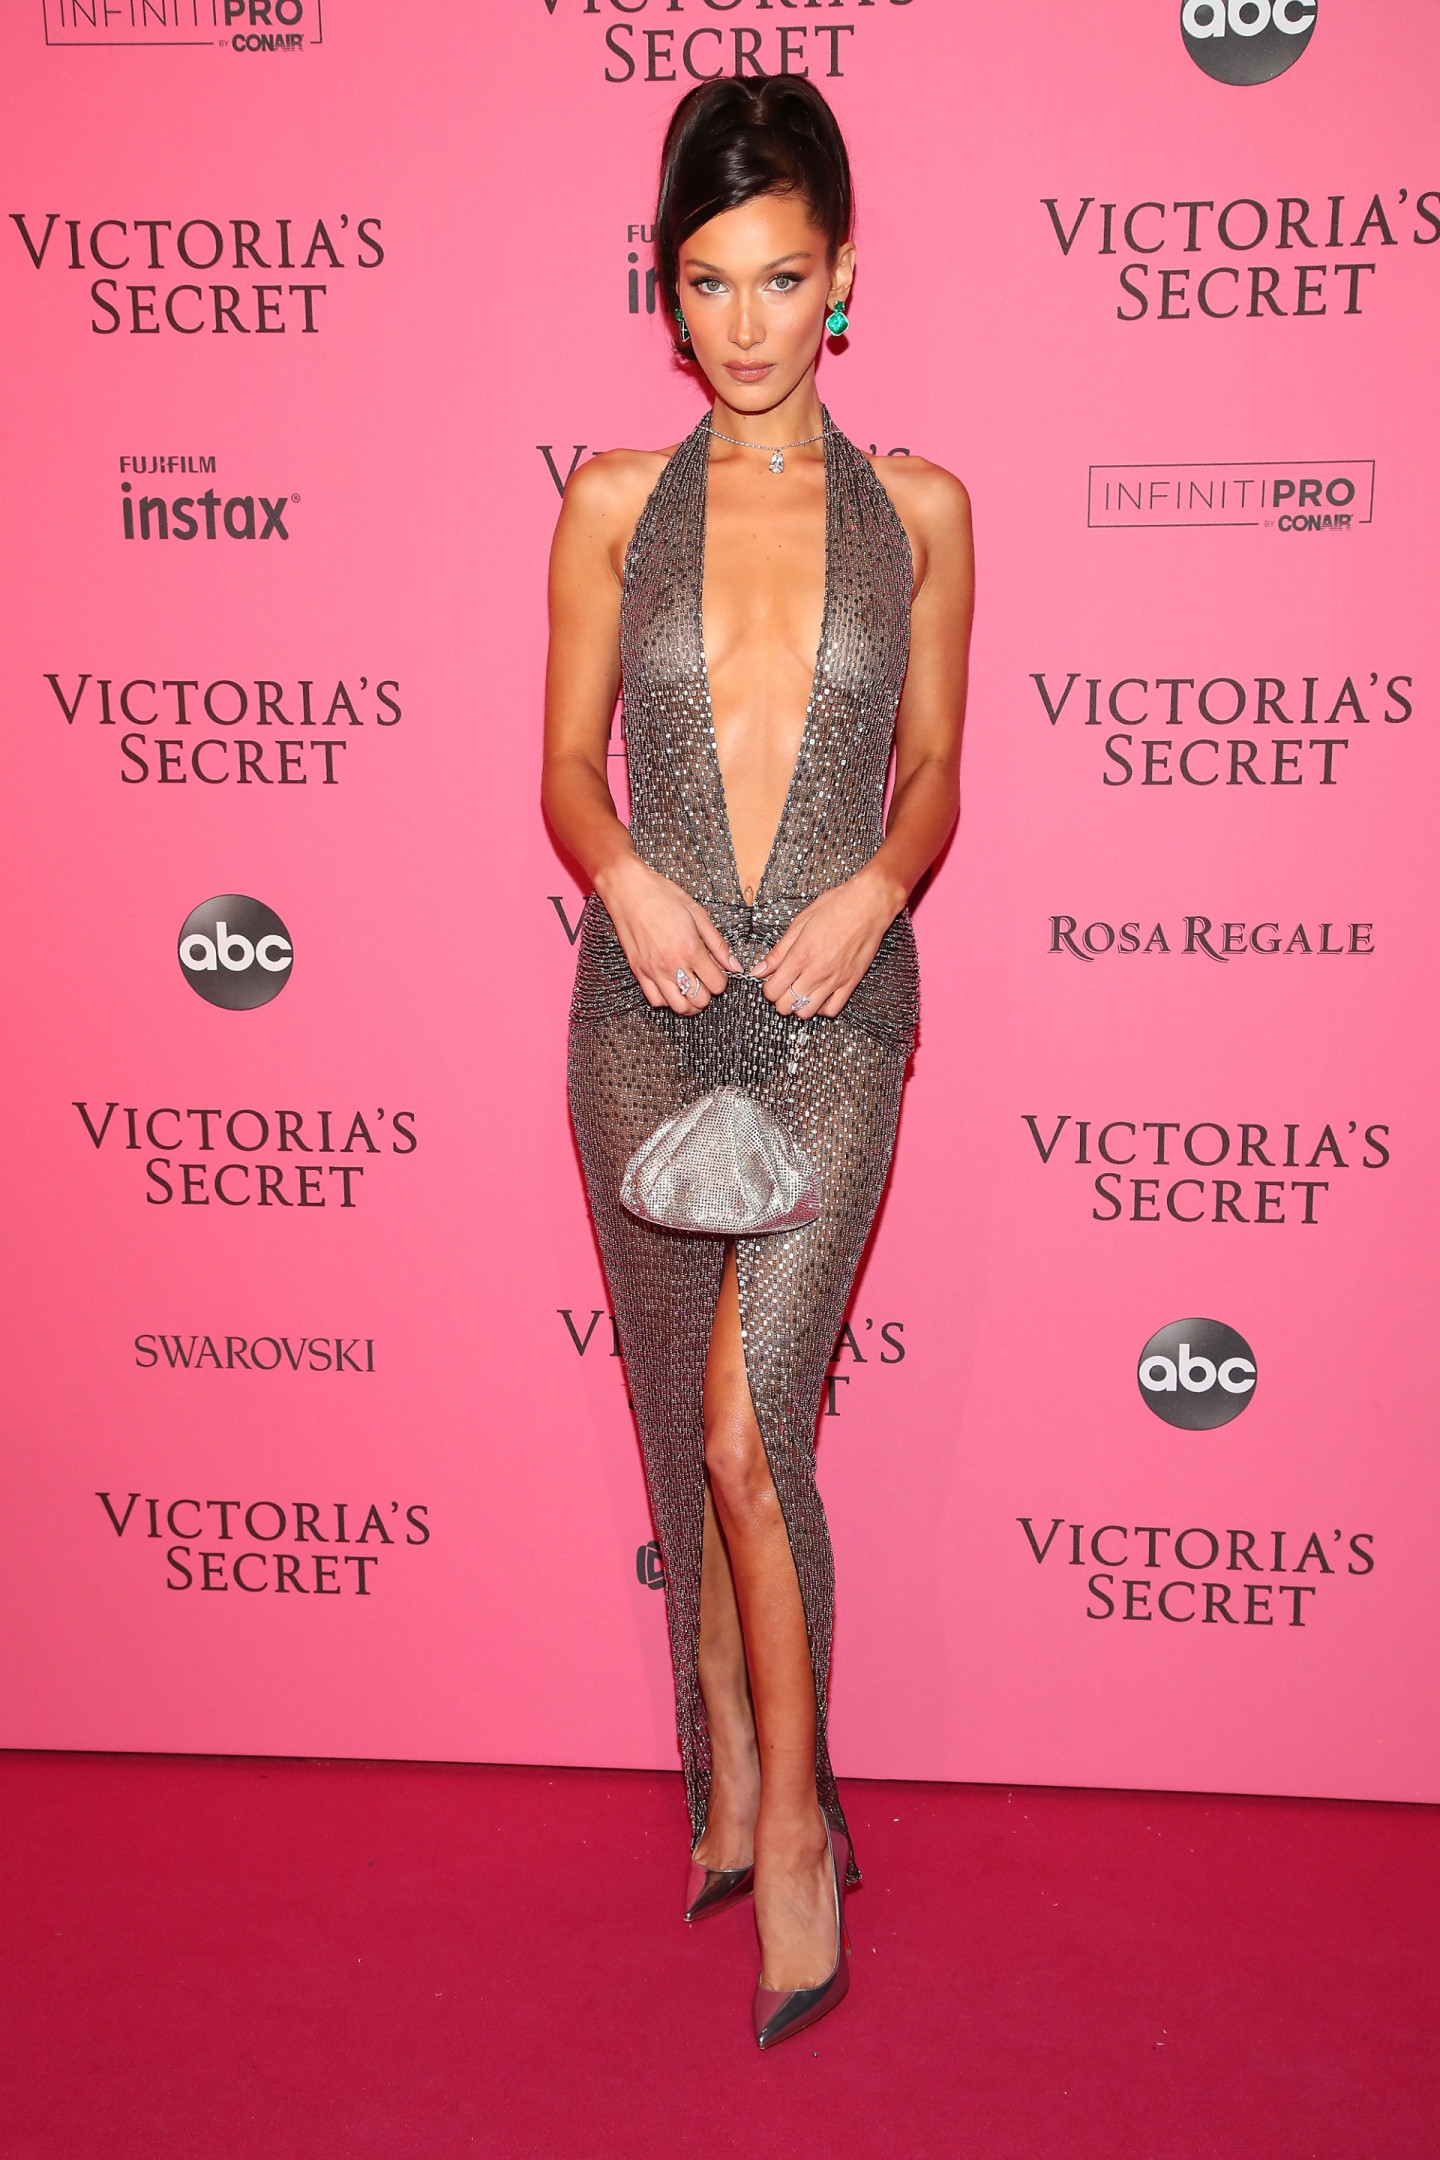 Белла Хадид в платье Julien Macdonald на афтепати показа Victoria's Secret, 2018